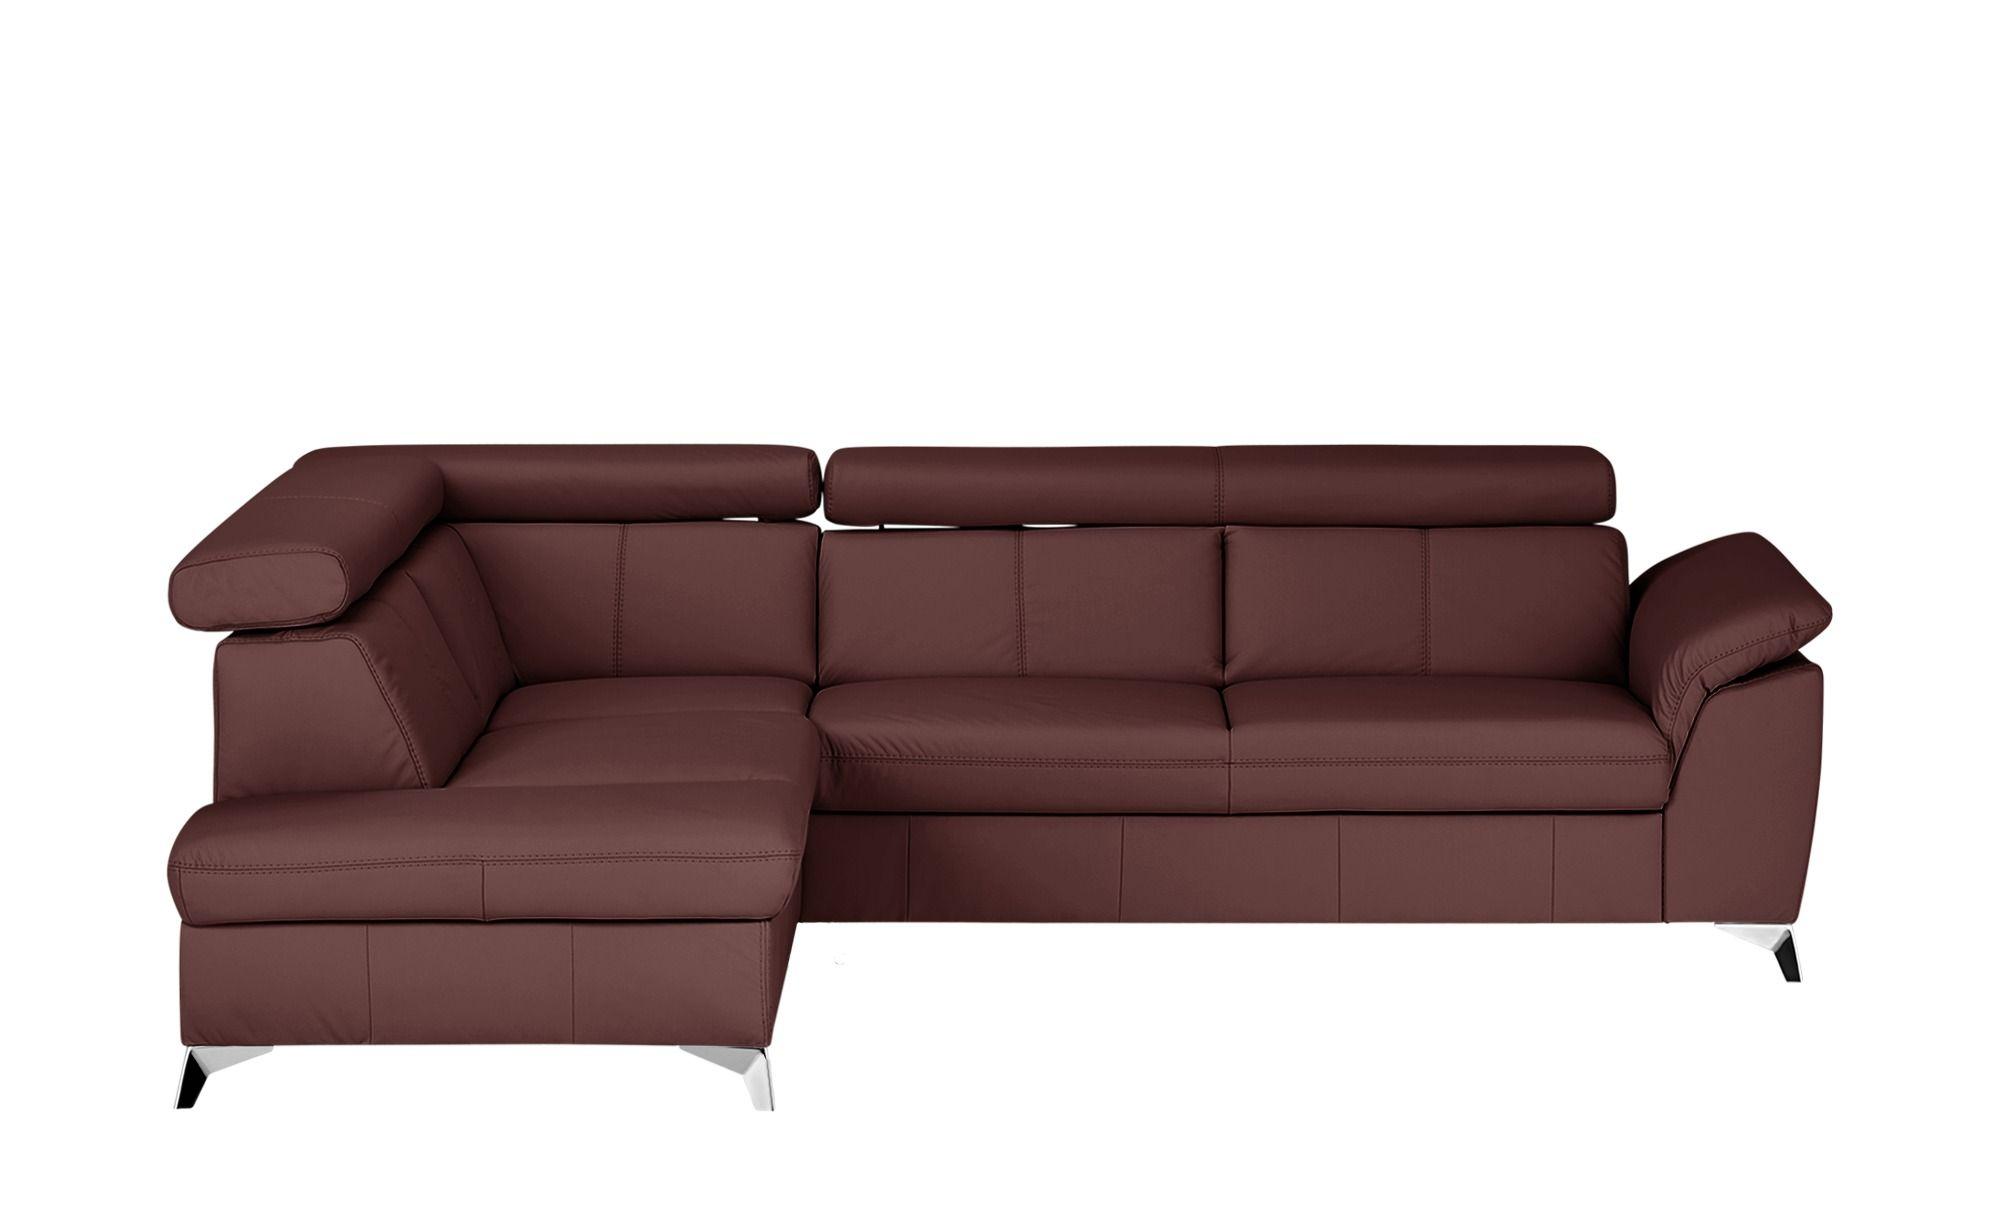 Mobel Hoffner Sofa Mit Relaxfunktion   Test